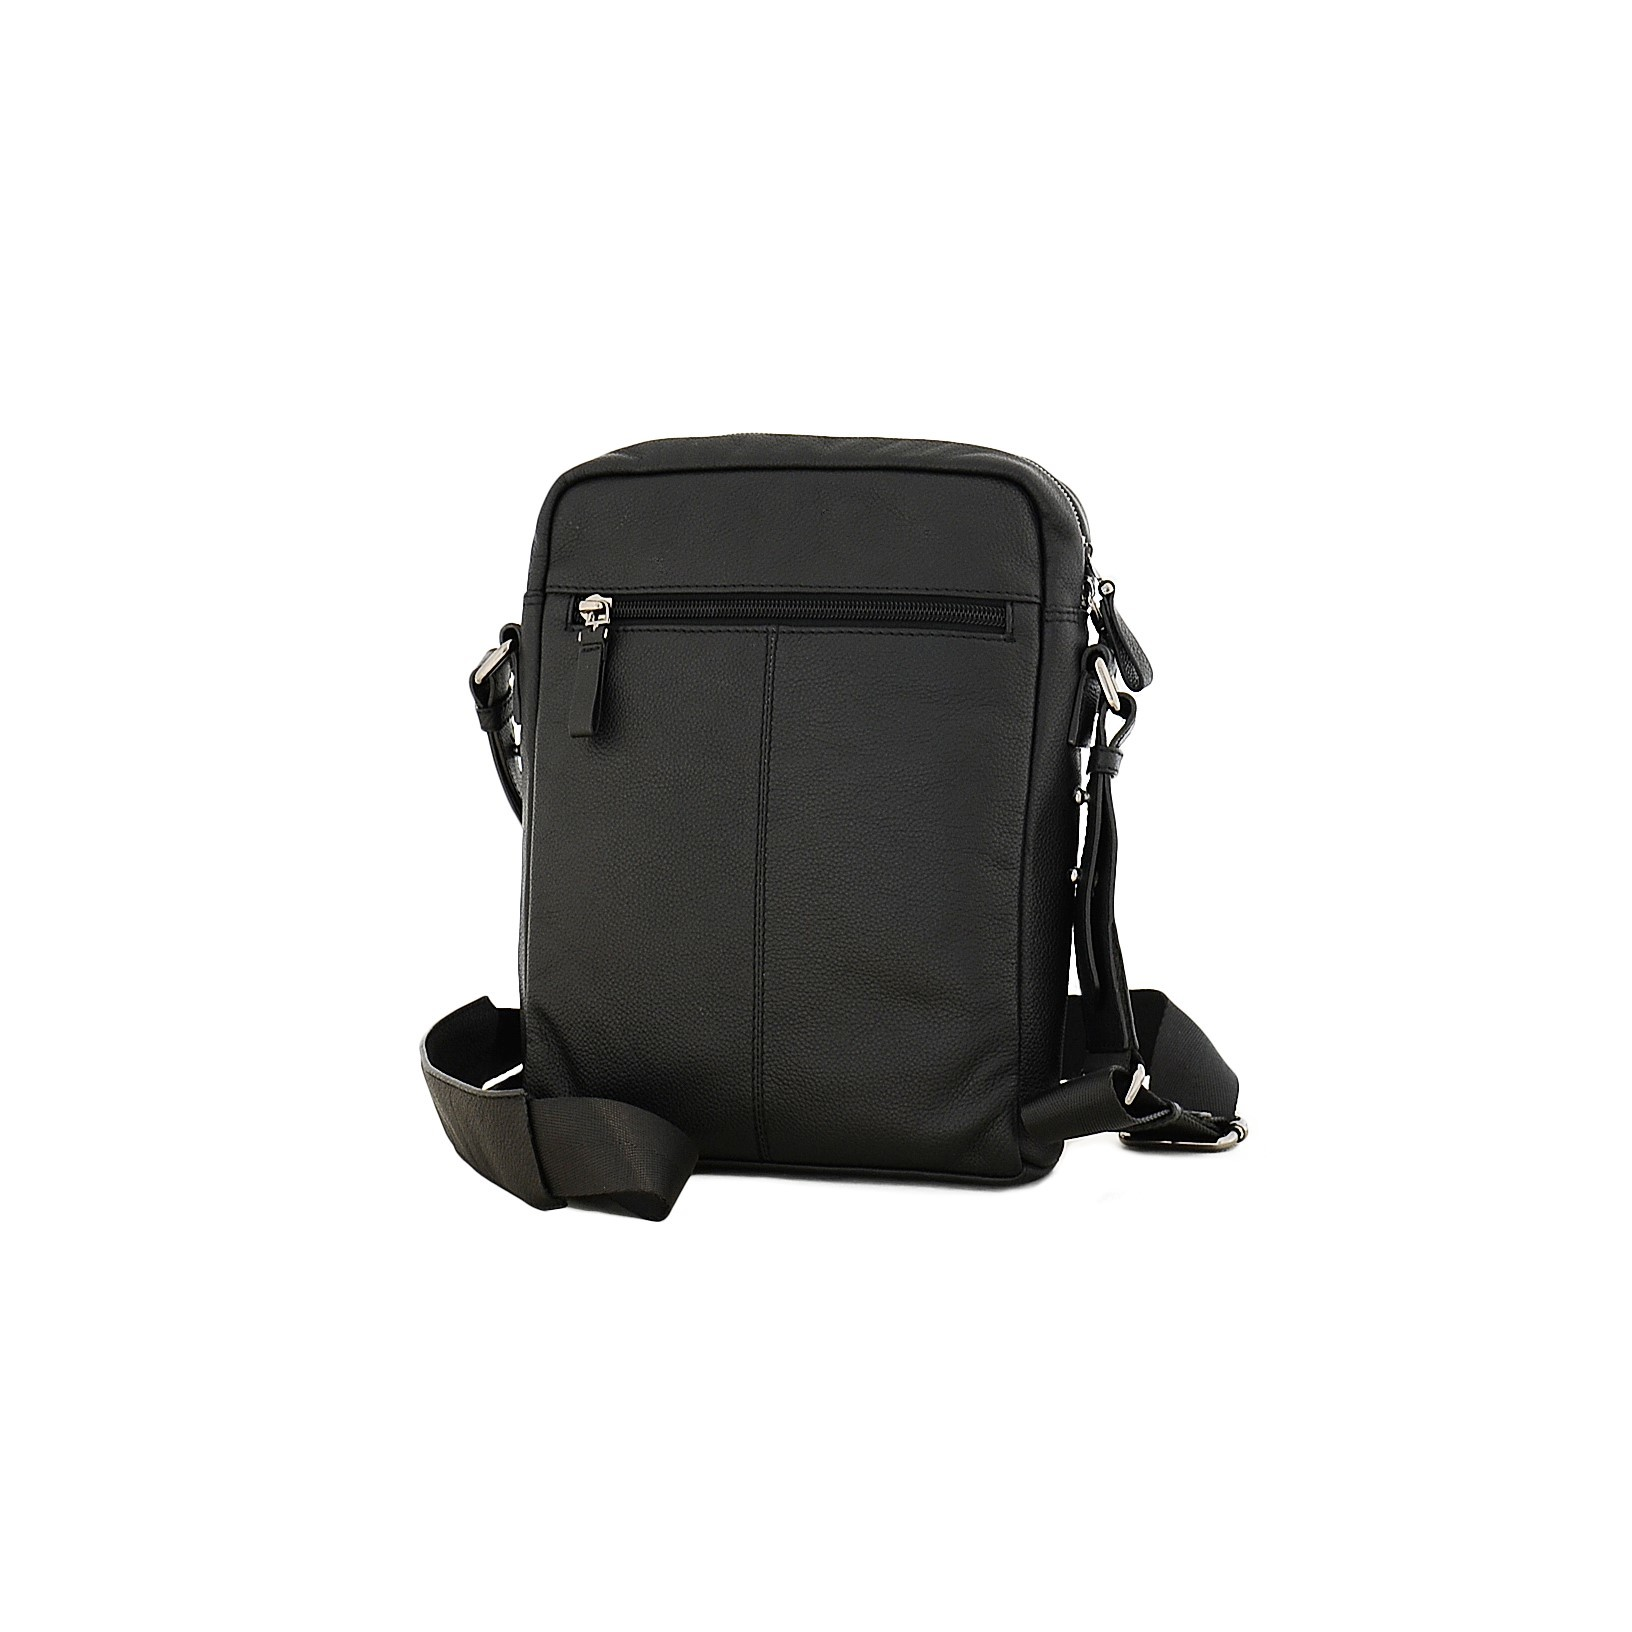 C800037 BLACK Сумка плечевая MP